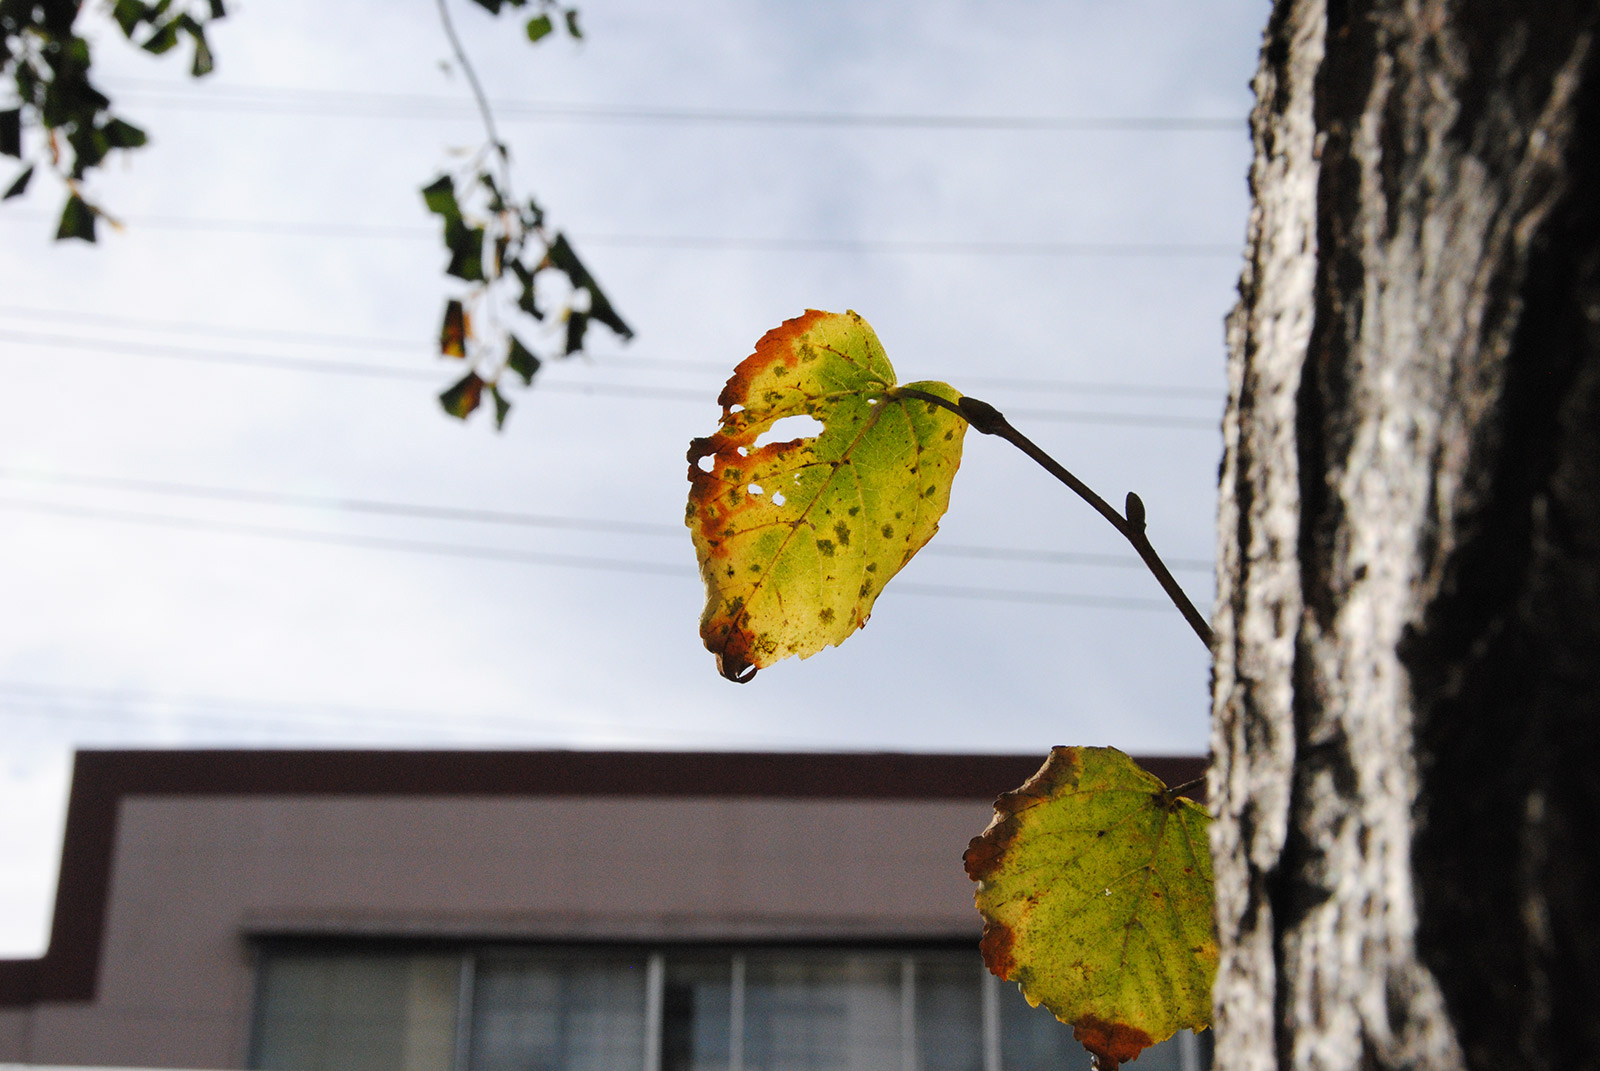 SNAP: Hints of Autumn